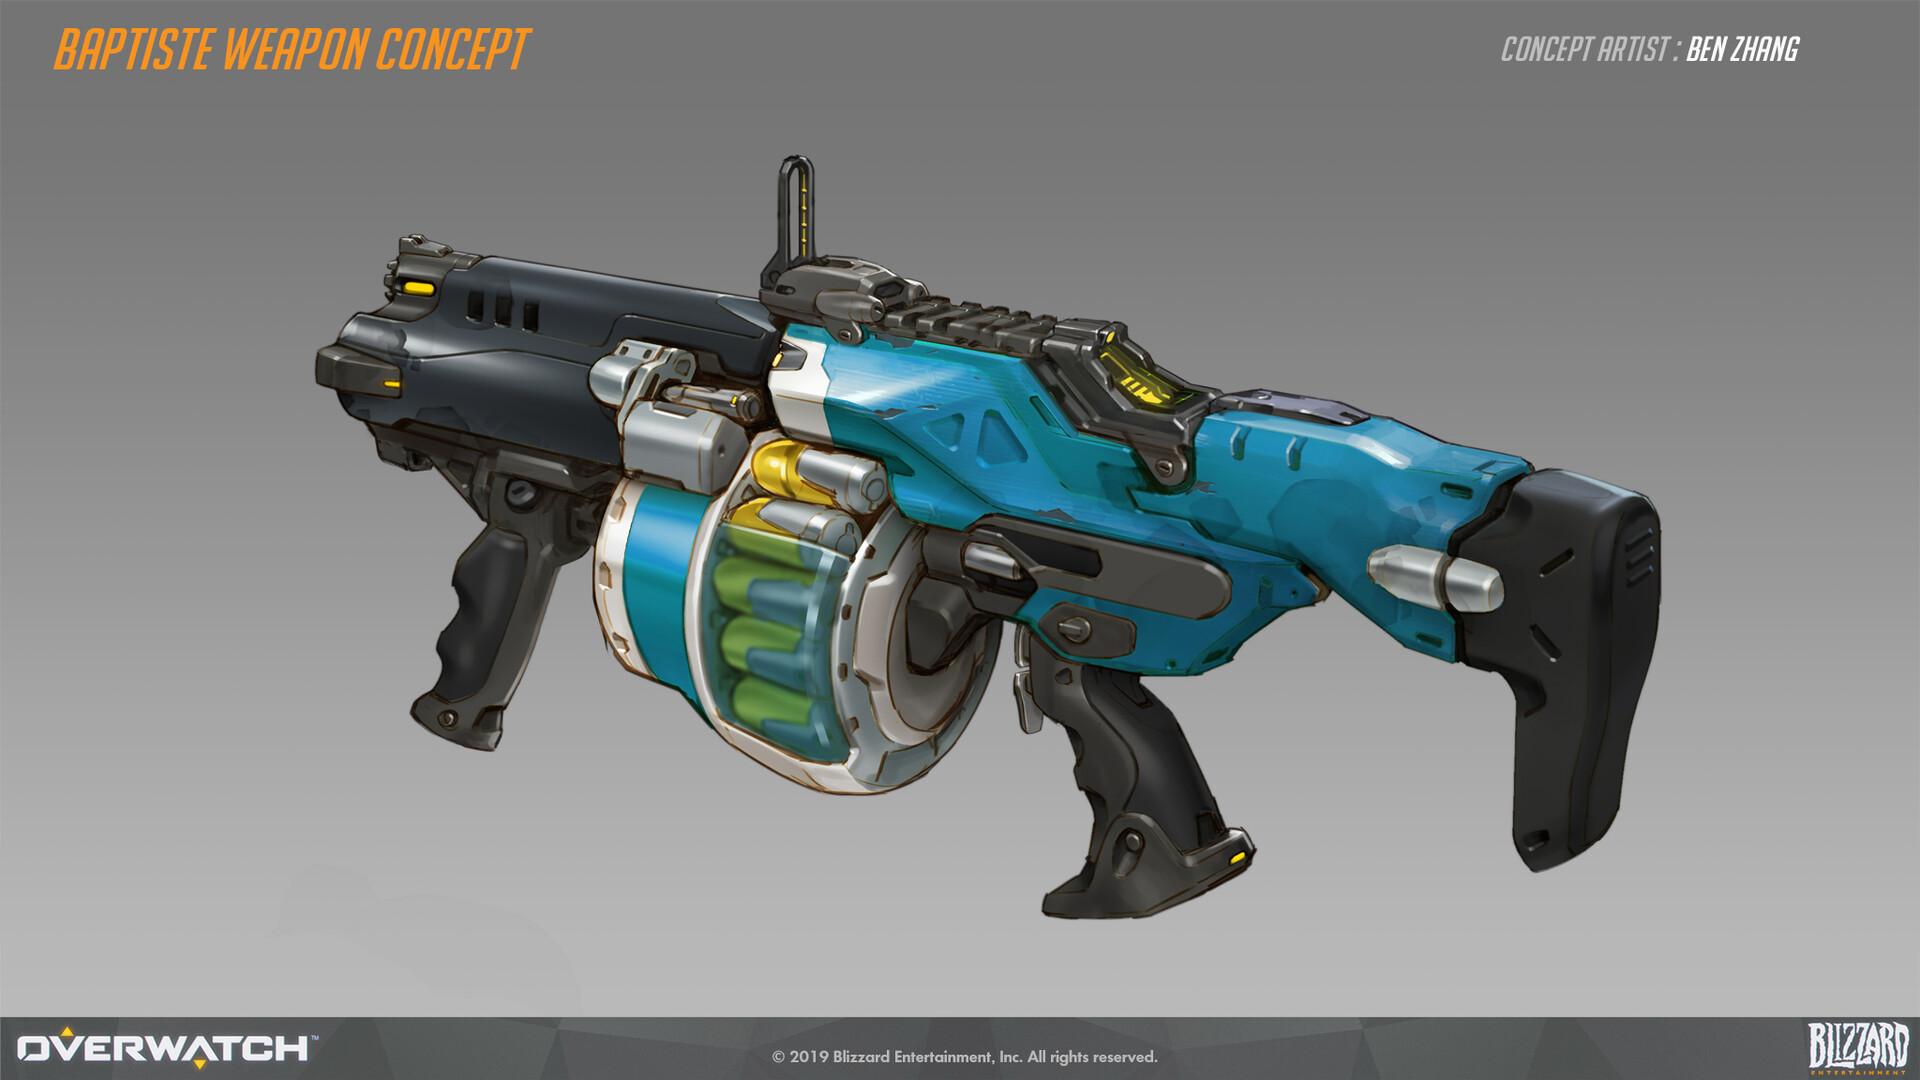 Ben zhang baptiste weapon concept